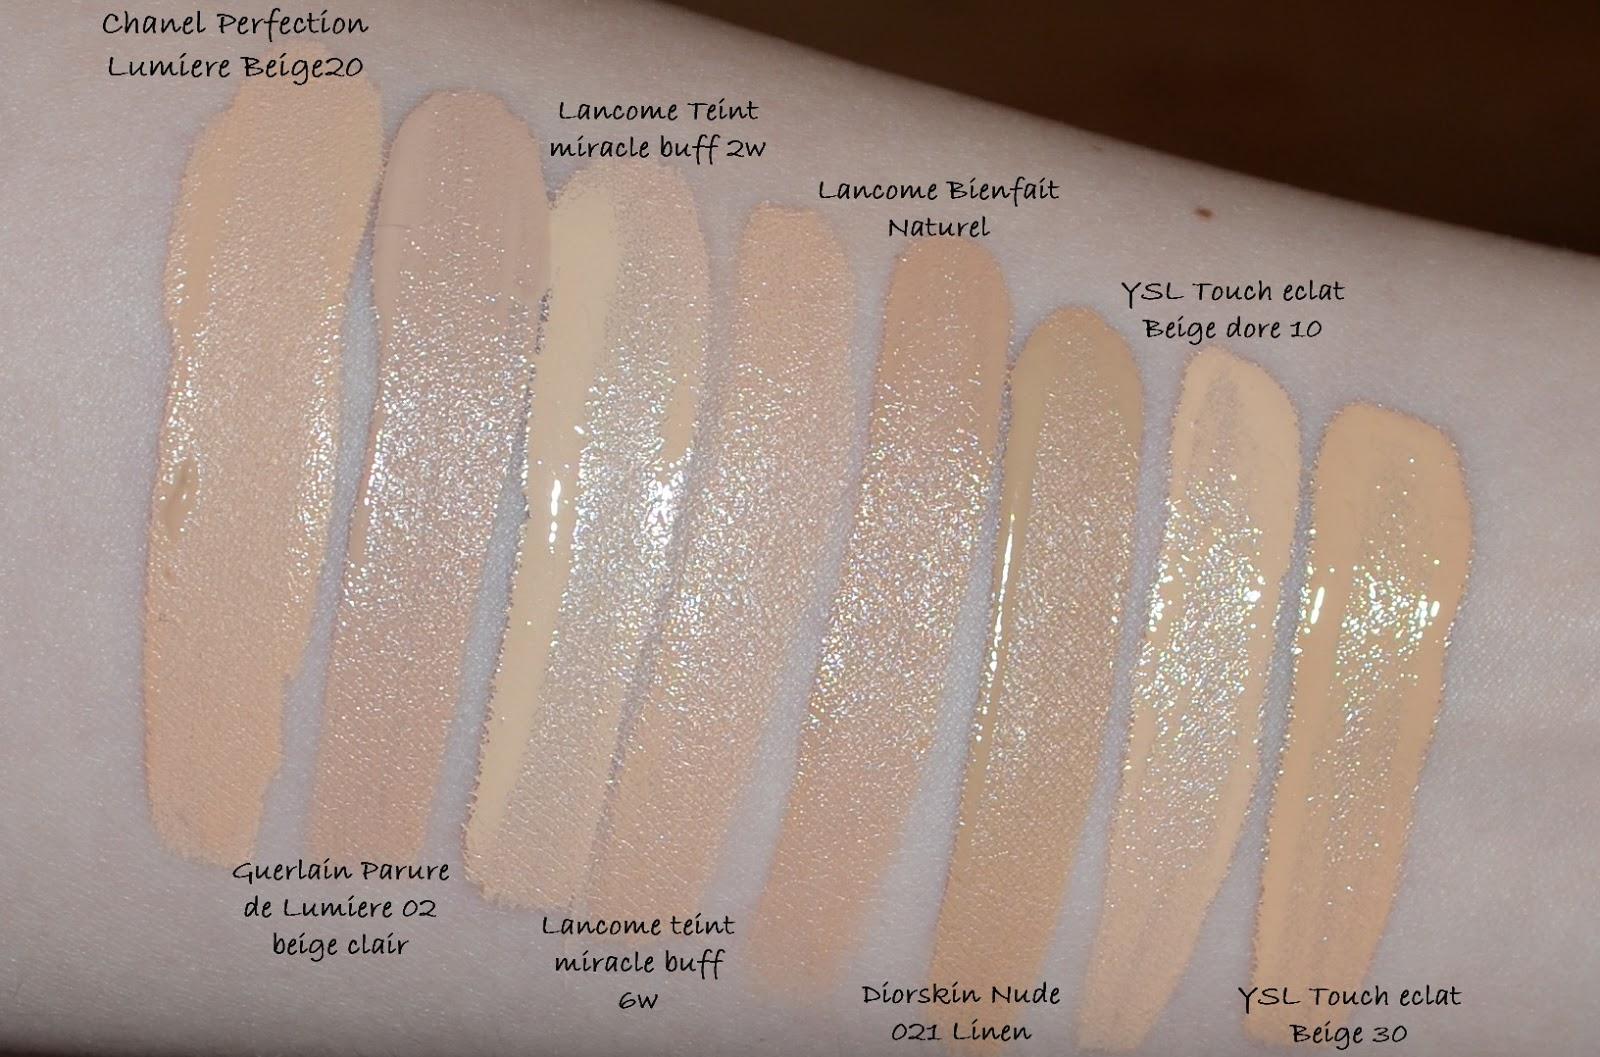 Skin Nude Concealer by Dior #8